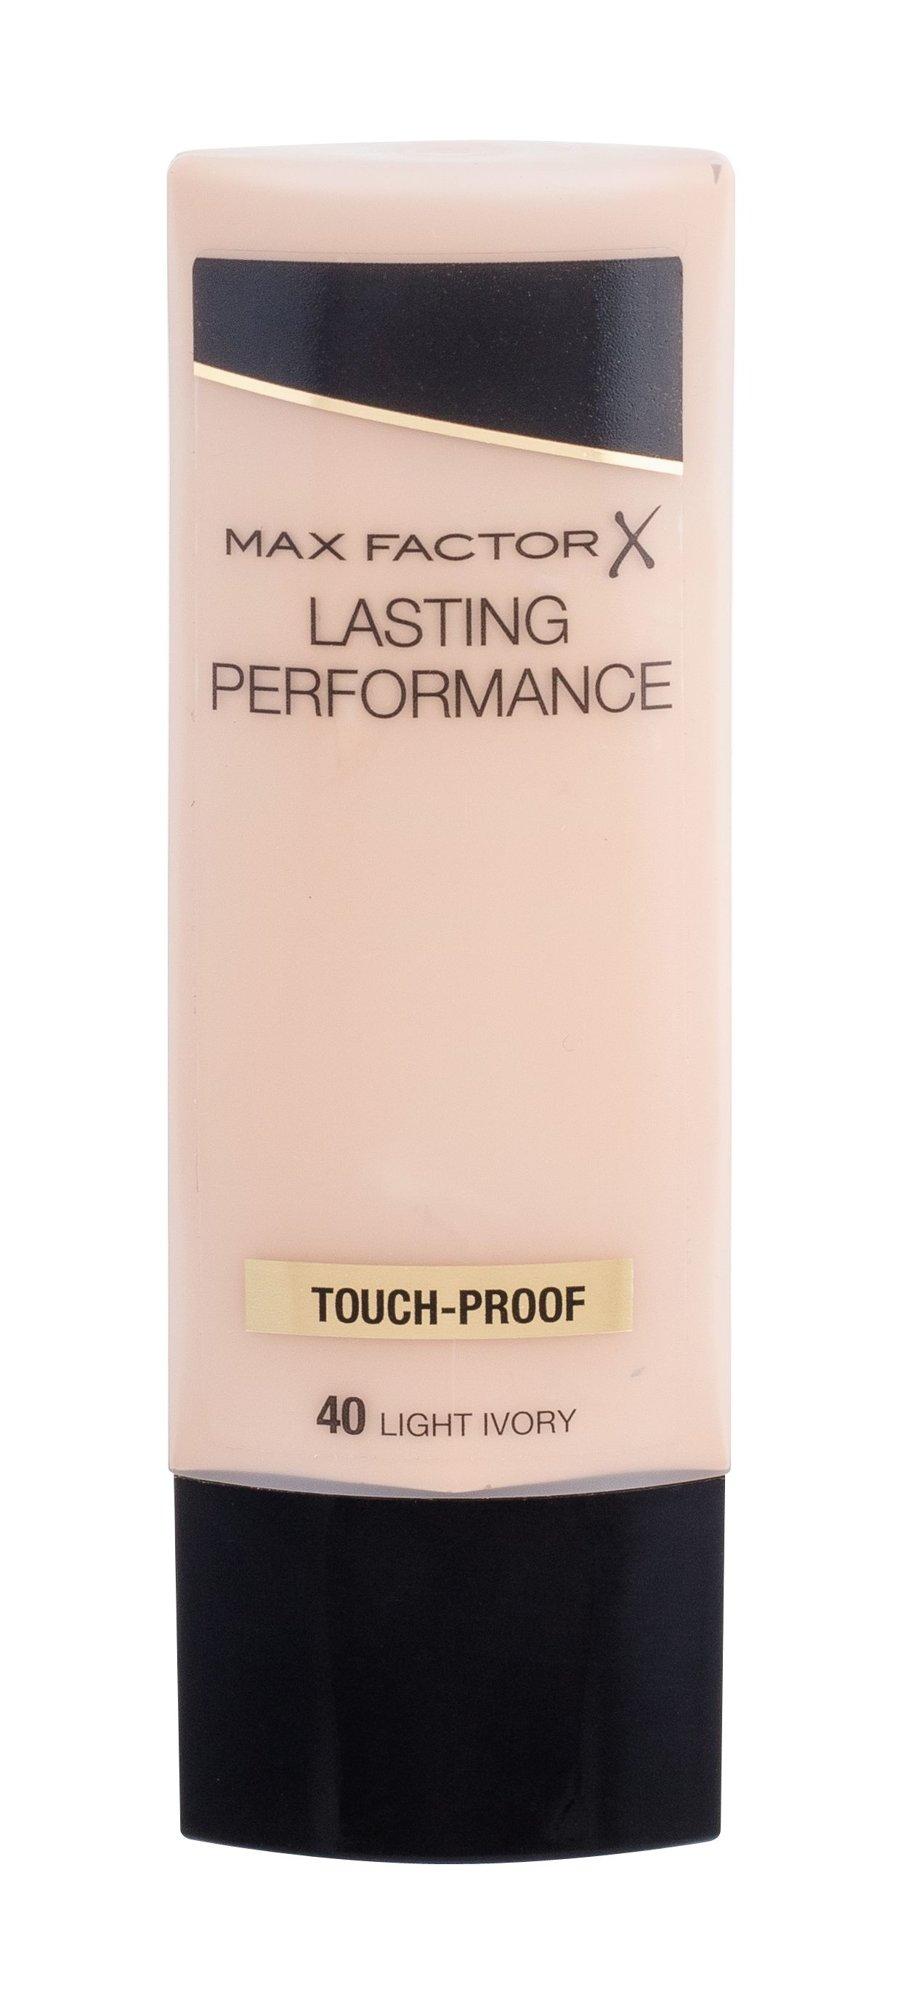 Max Factor Lasting Performance Makeup 35ml 40 Light Ivory